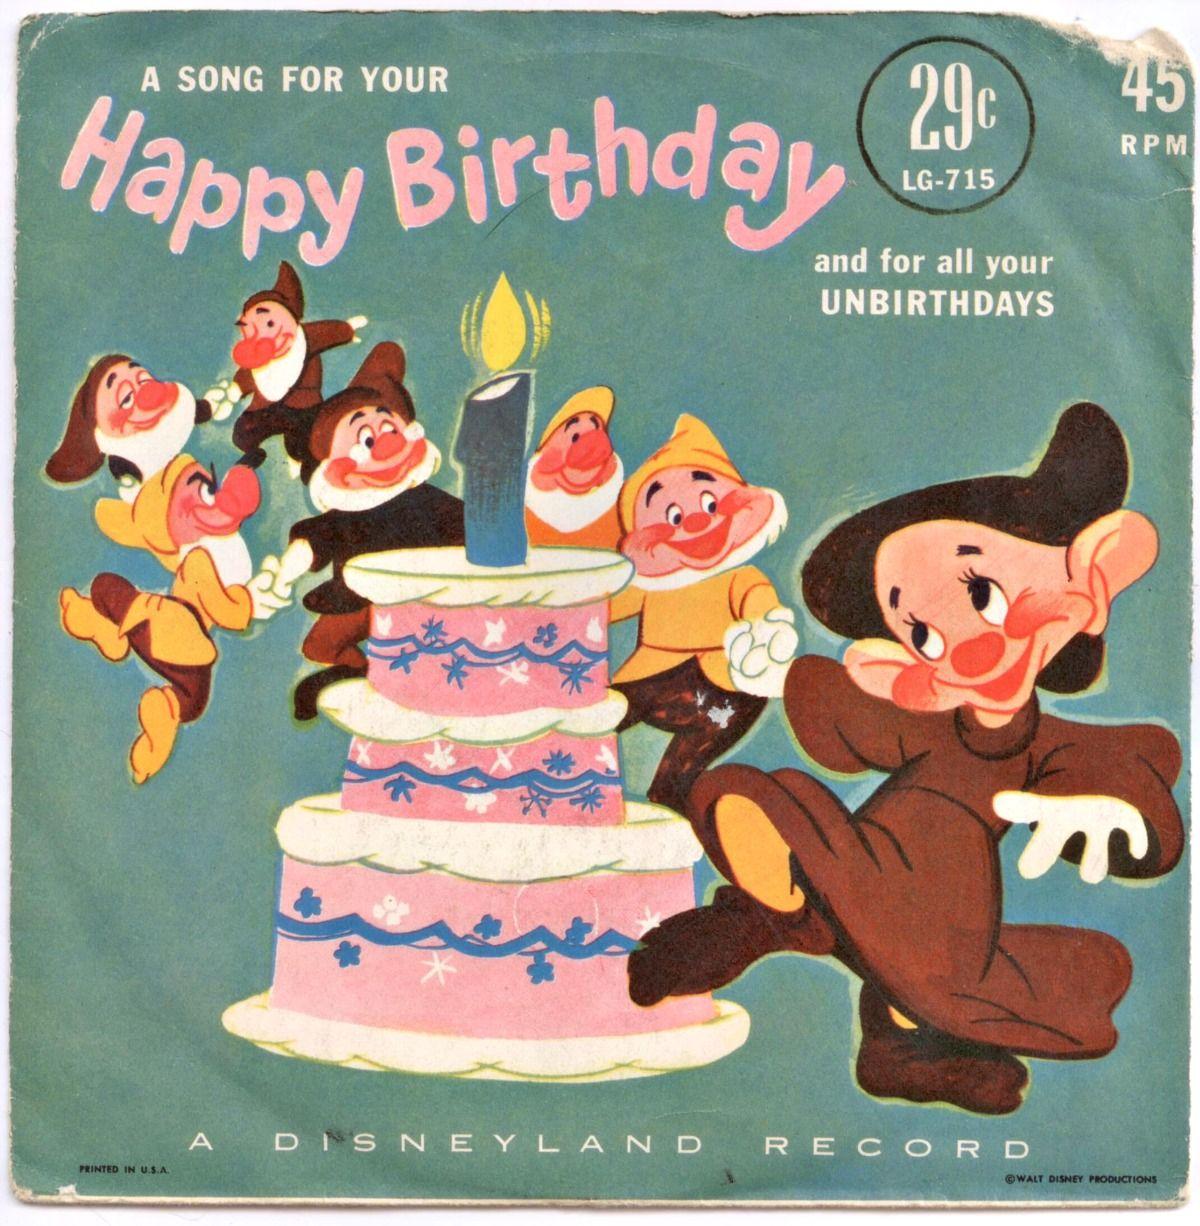 "Happy Birthday, A Disneyland Record 7"" Disney Records"